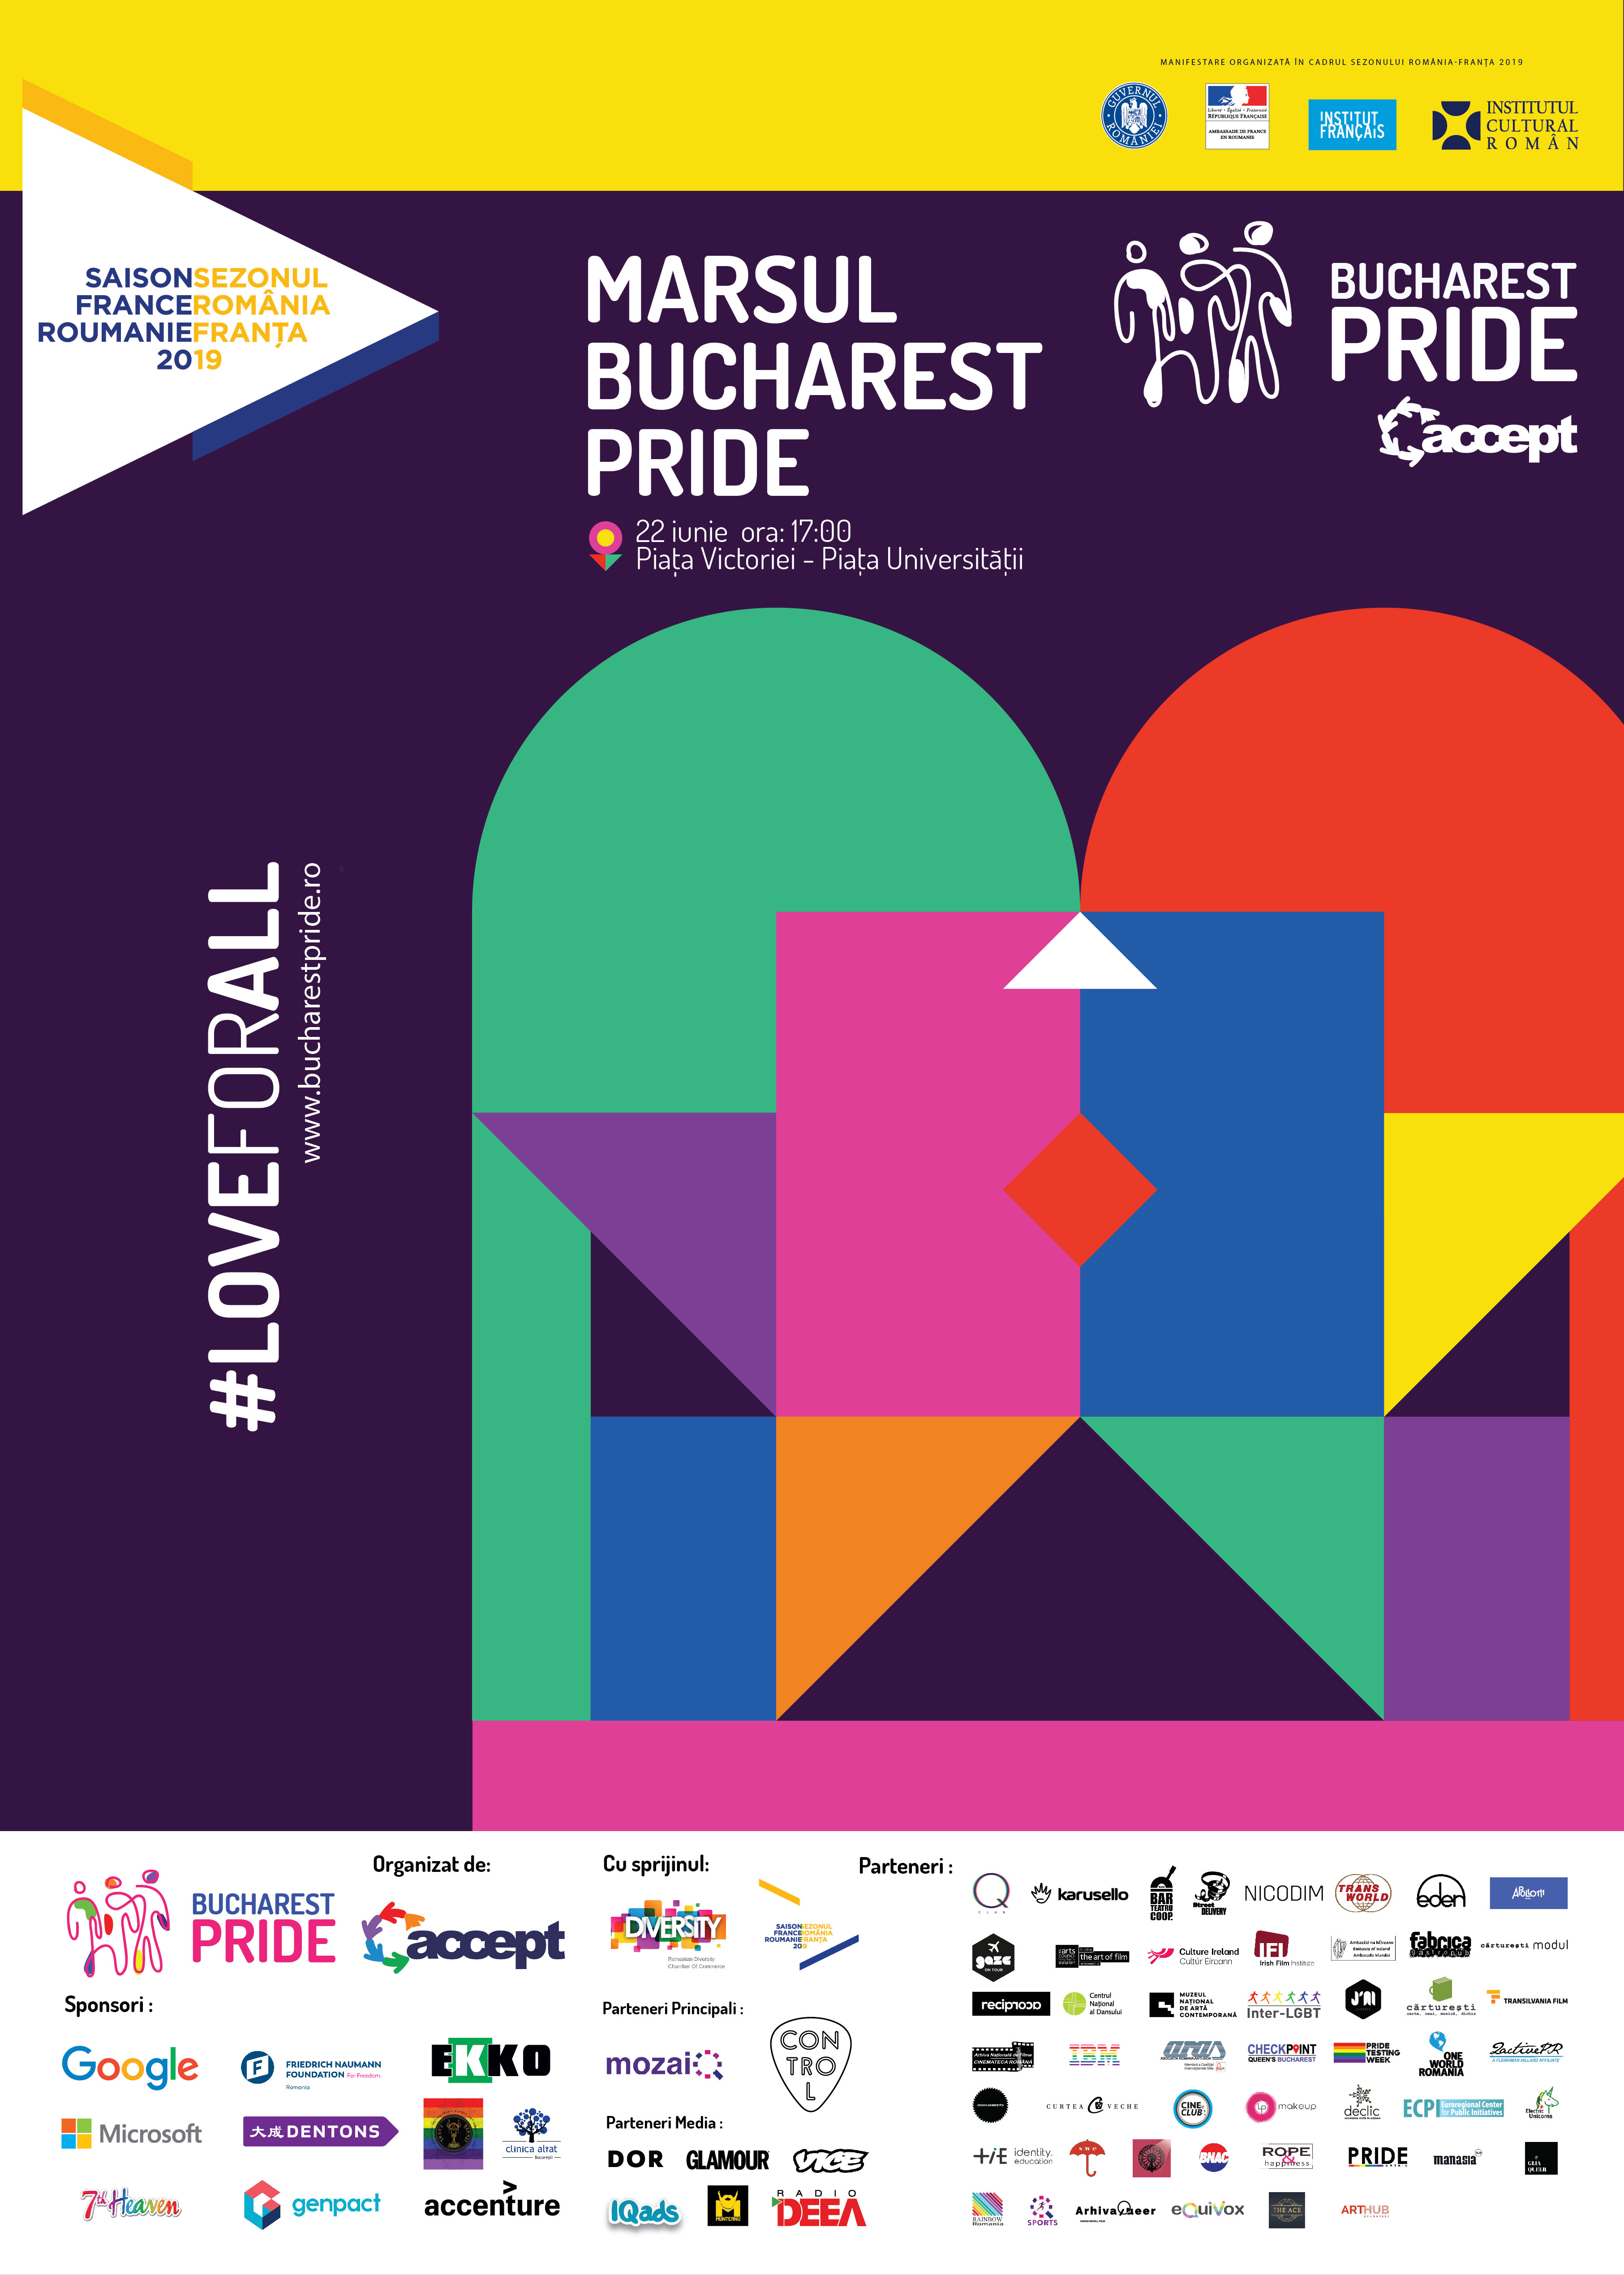 Bucharest Pride 2019 #loveforall